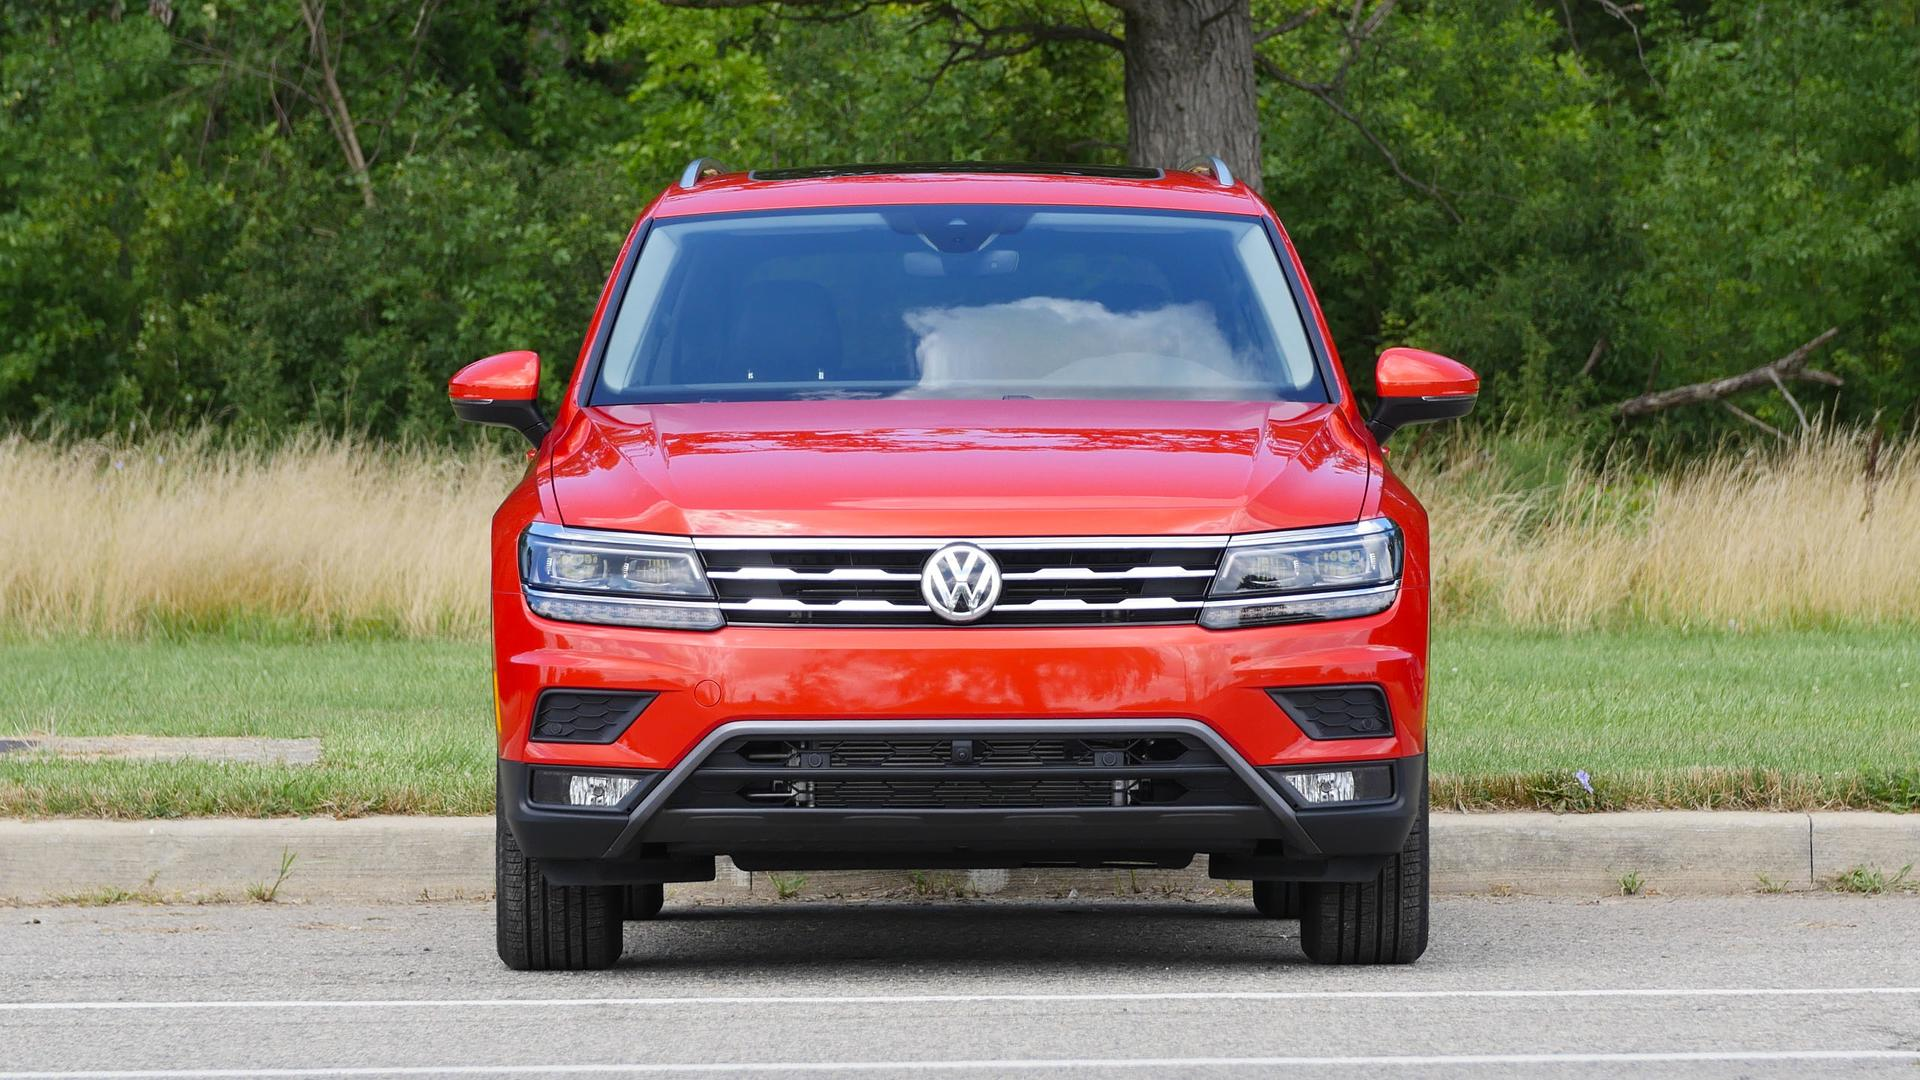 2018 VW Tiguan Hybrid: Rumor Or Reality? >> Vw Allegedly Preparing Tiguan Coupe For 2018